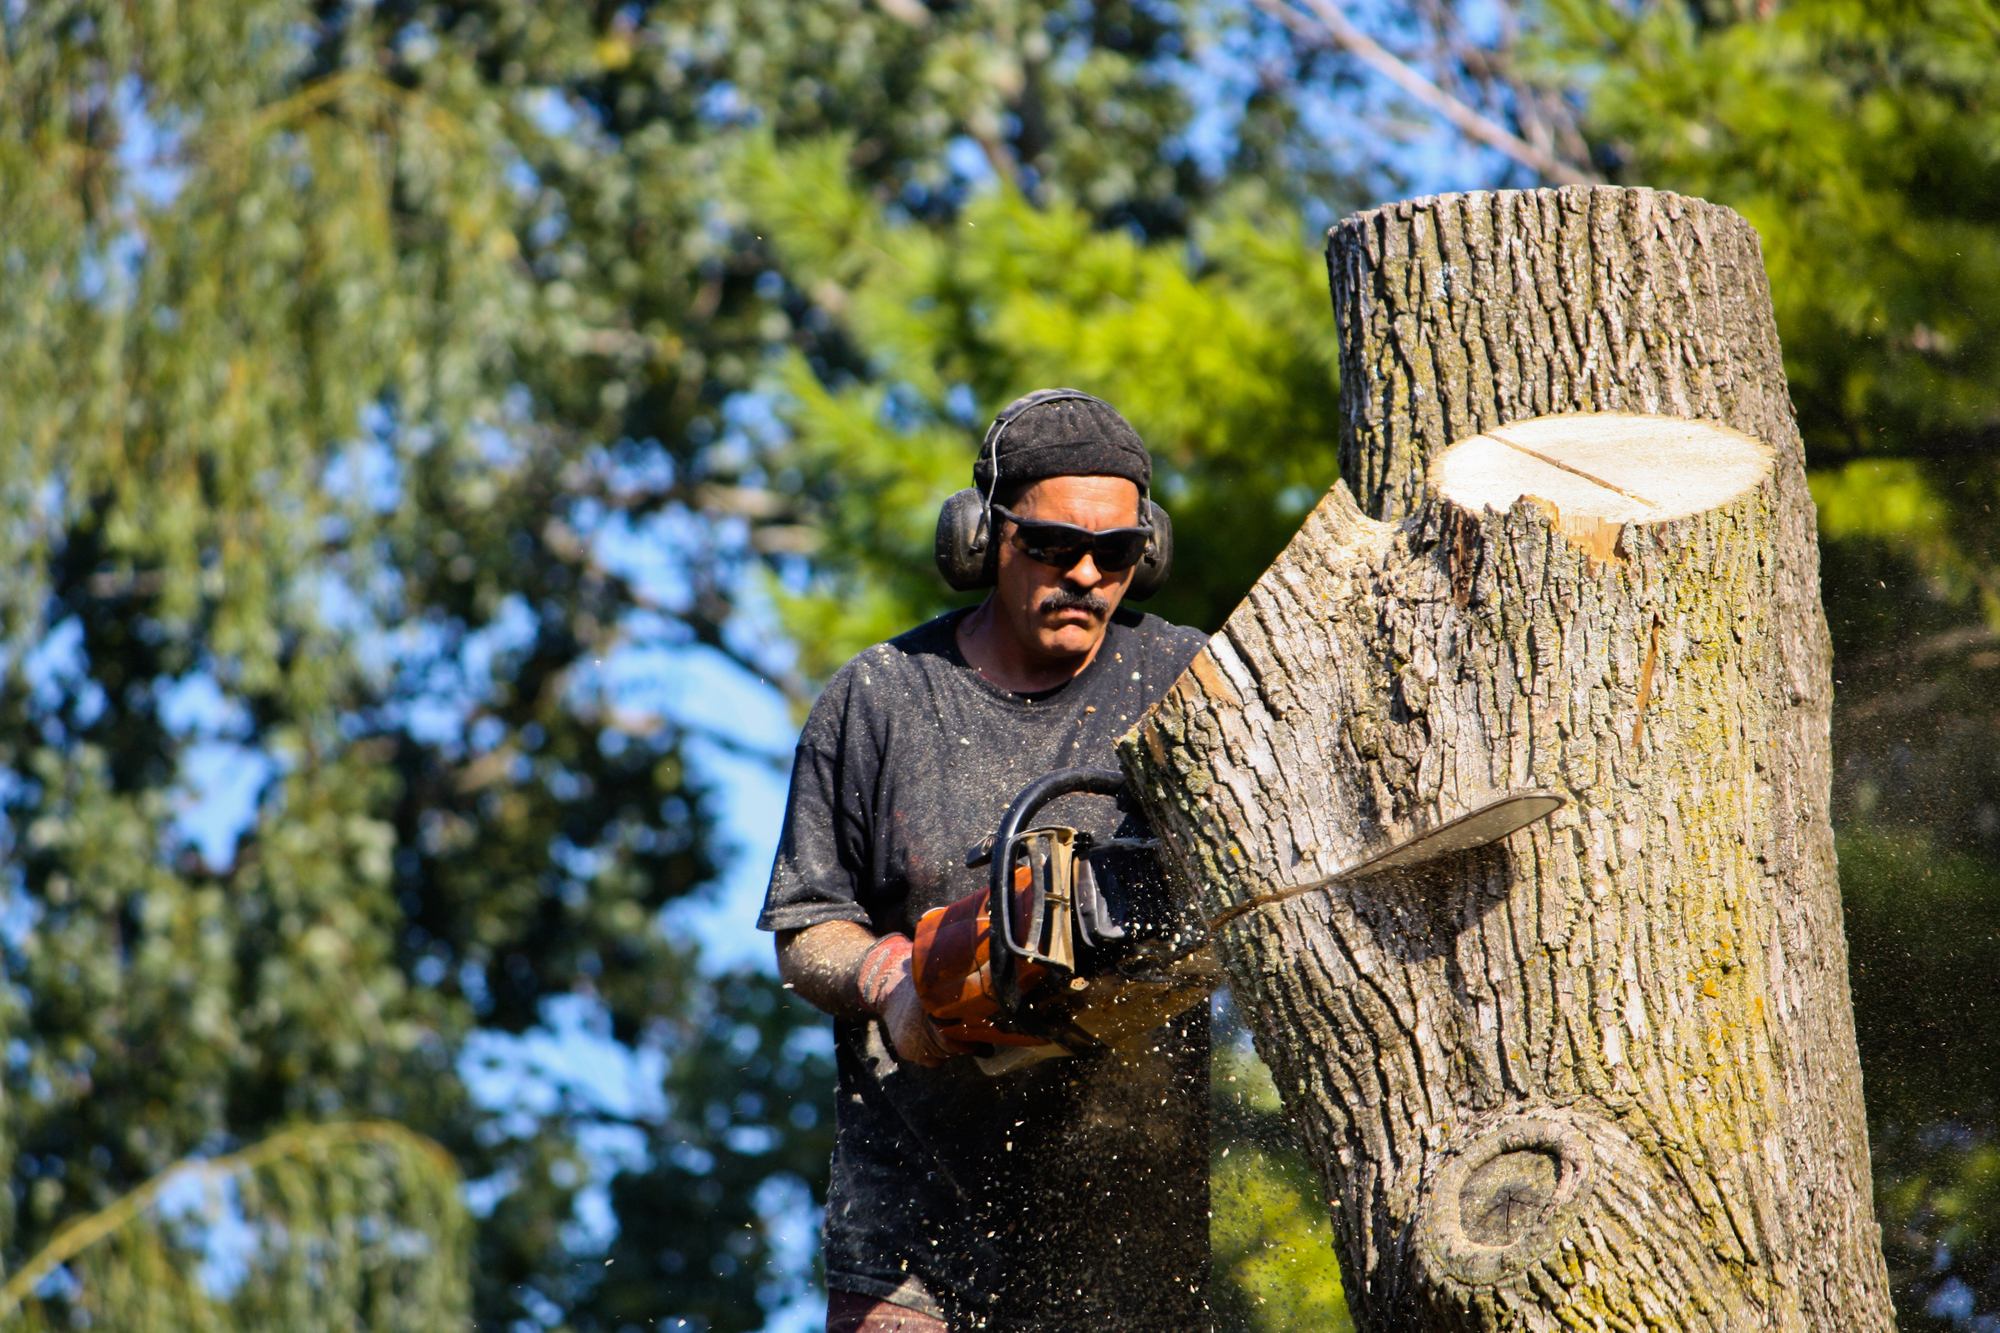 tree and shrub removal